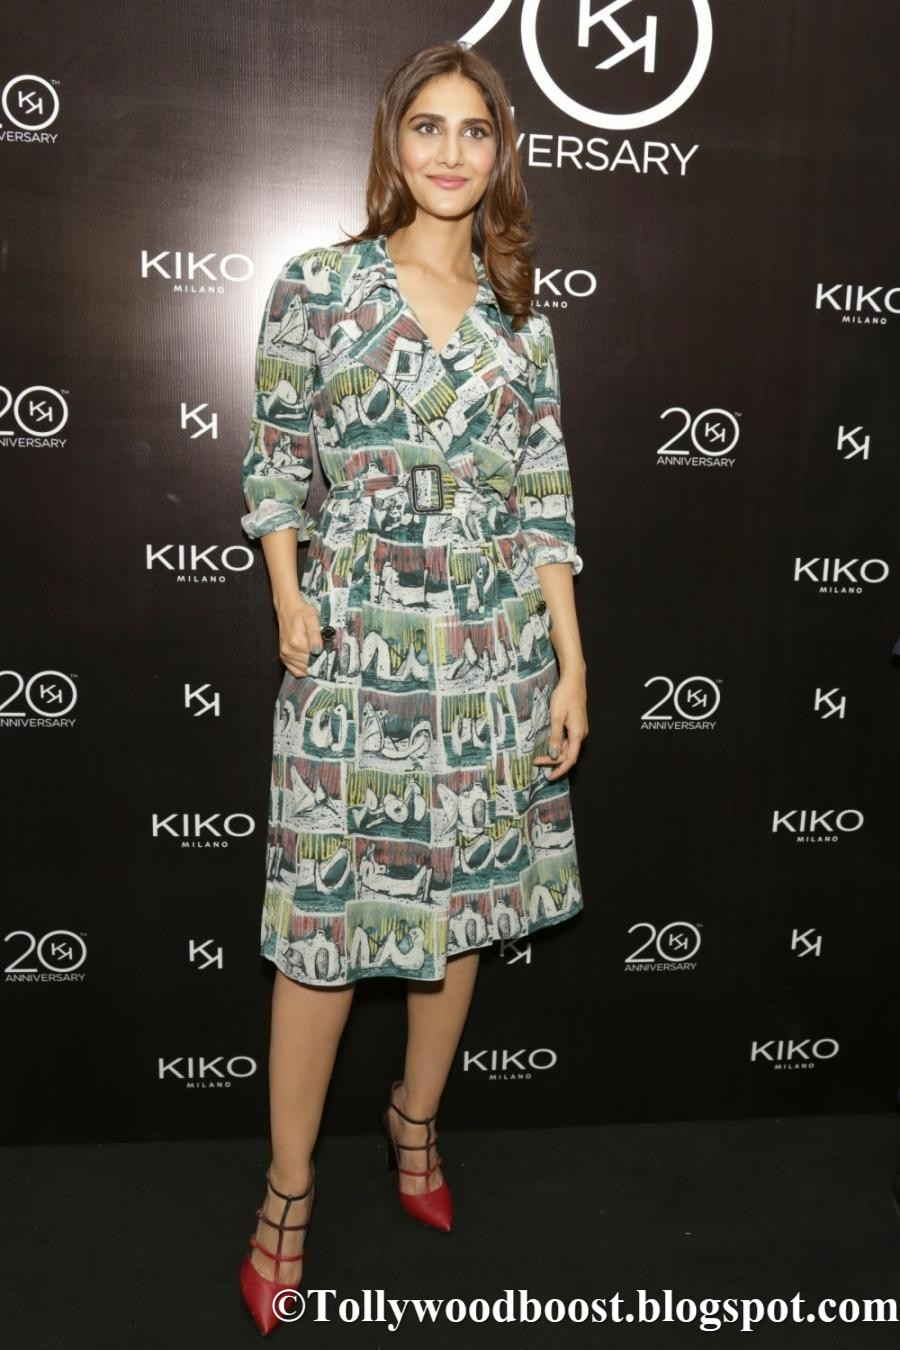 Actress Vaani Kapoor Legs Show Images In Green Dress